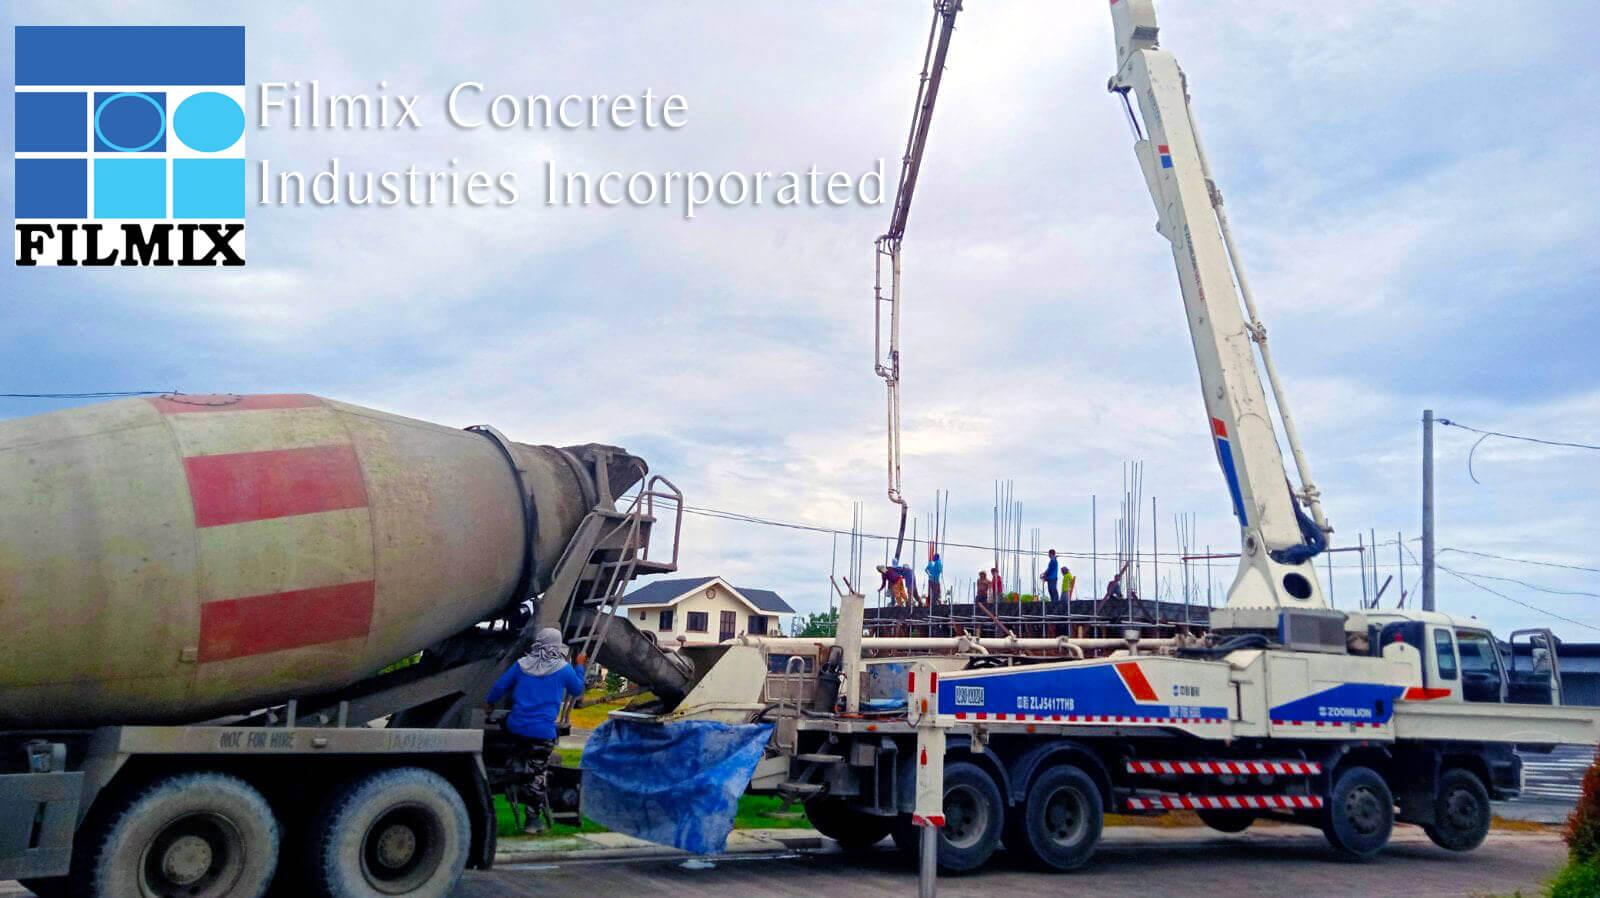 Filmix blog post image - ready mix concrete suppliers